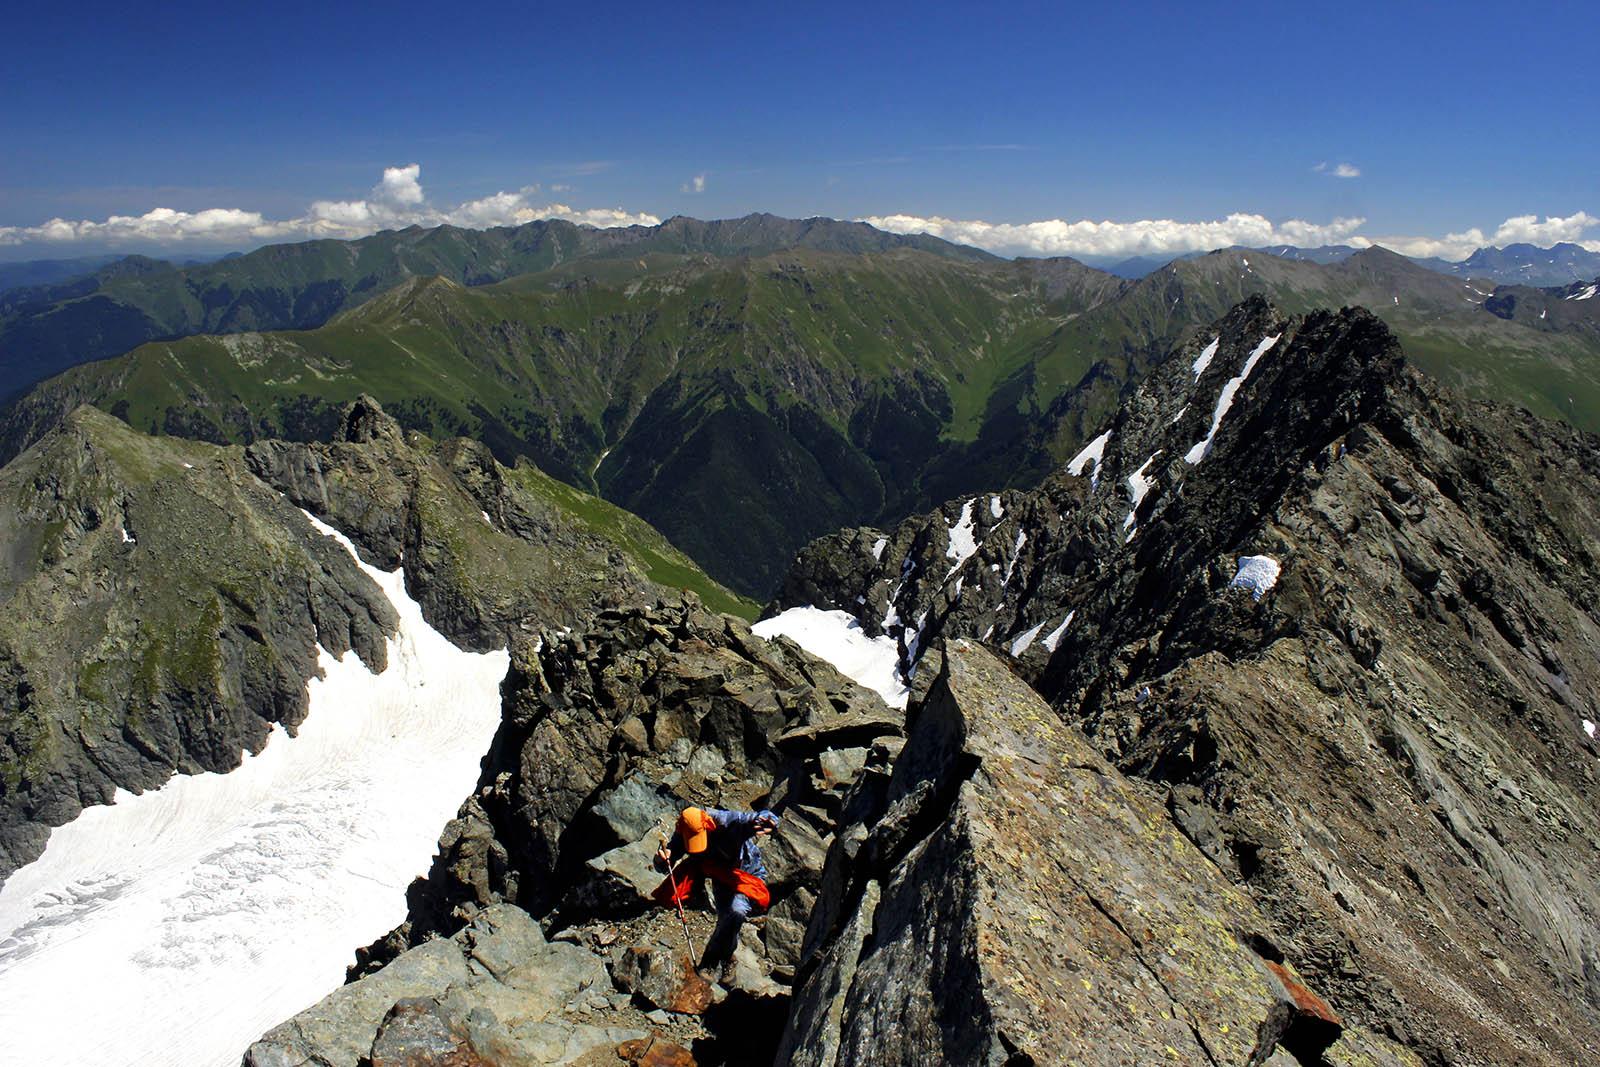 походы горы сочи цахвоа